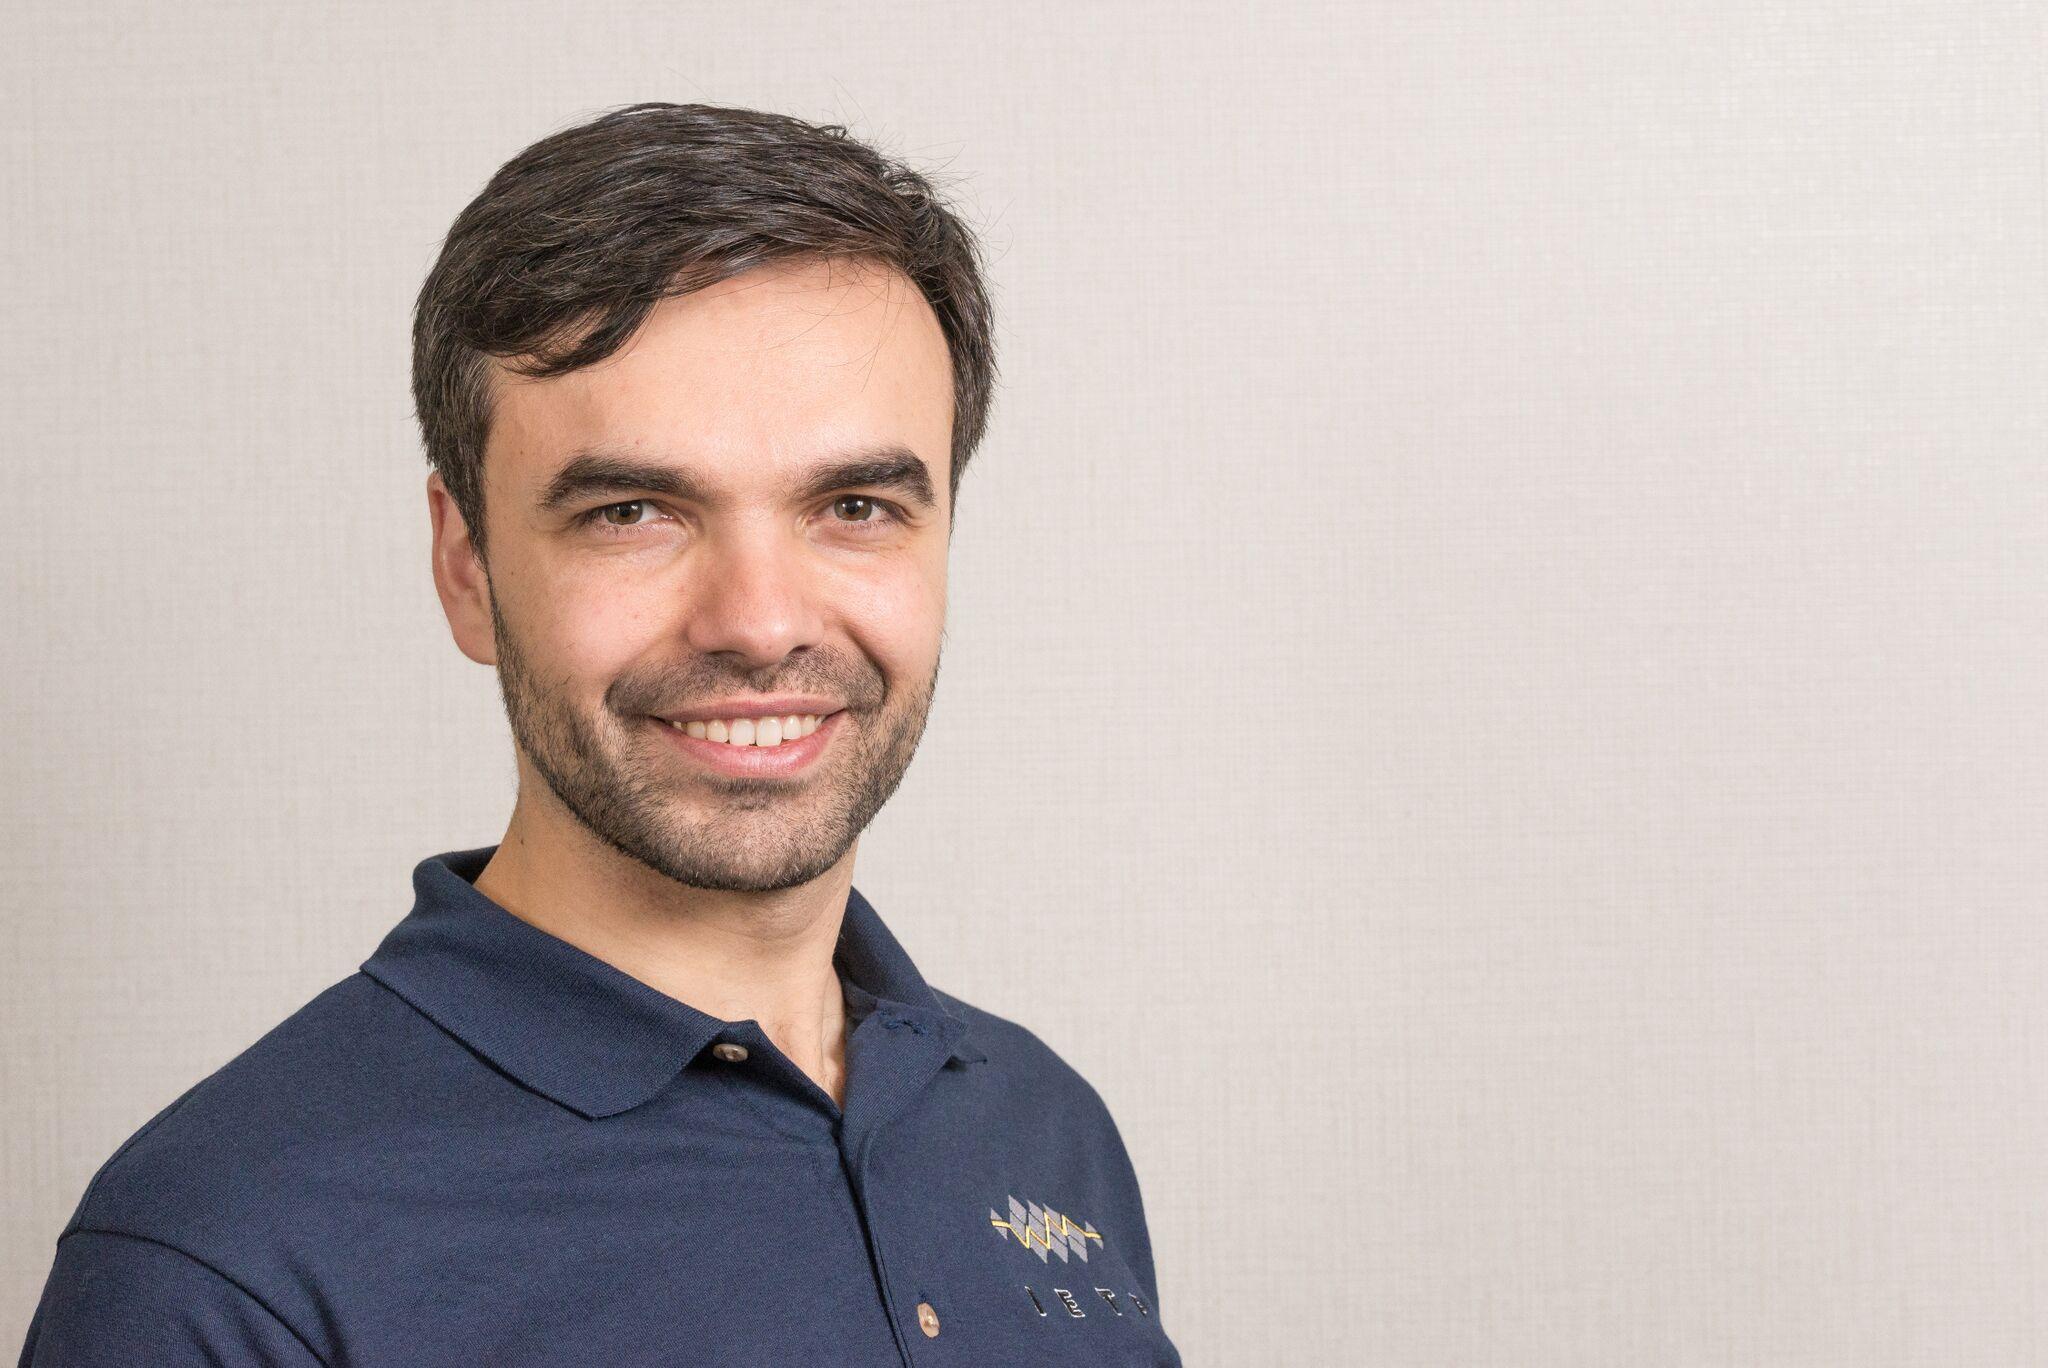 Photo of Alexander Pelov